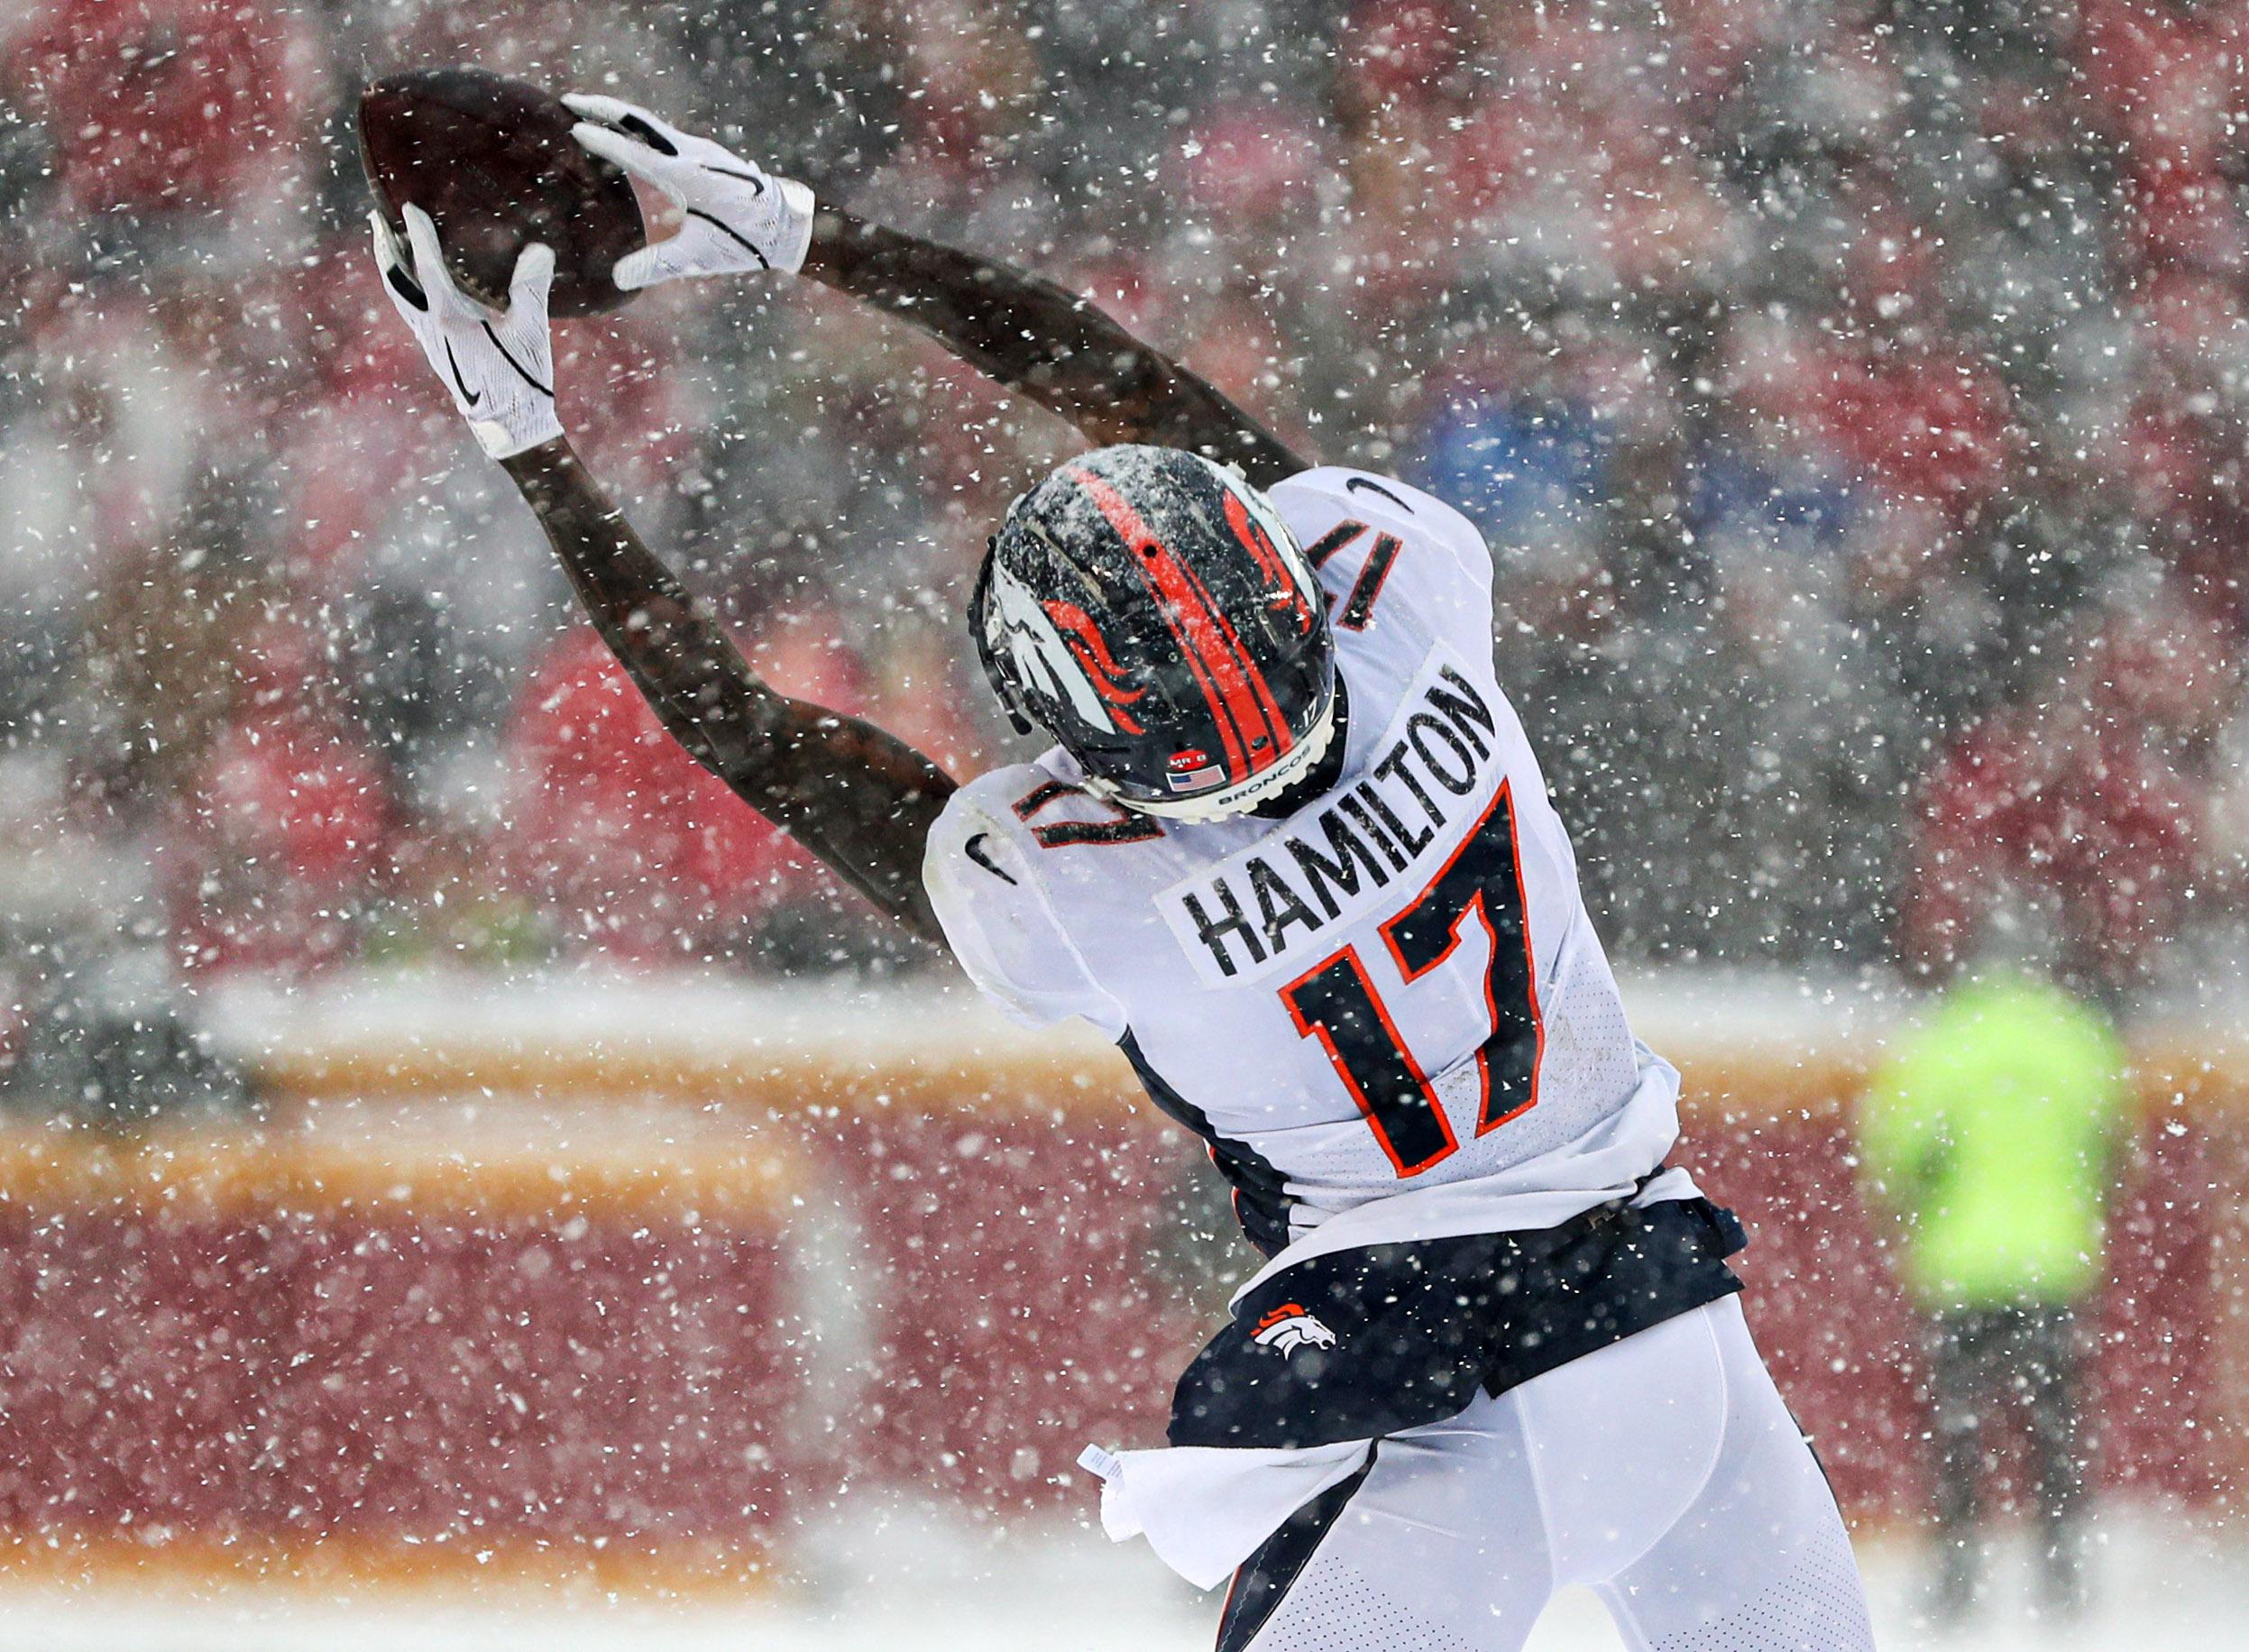 Denver Broncos wide receiver DaeSean Hamilton (17) bobbles the ball during the second half against the Kansas City Chiefs at Arrowhead Stadium.